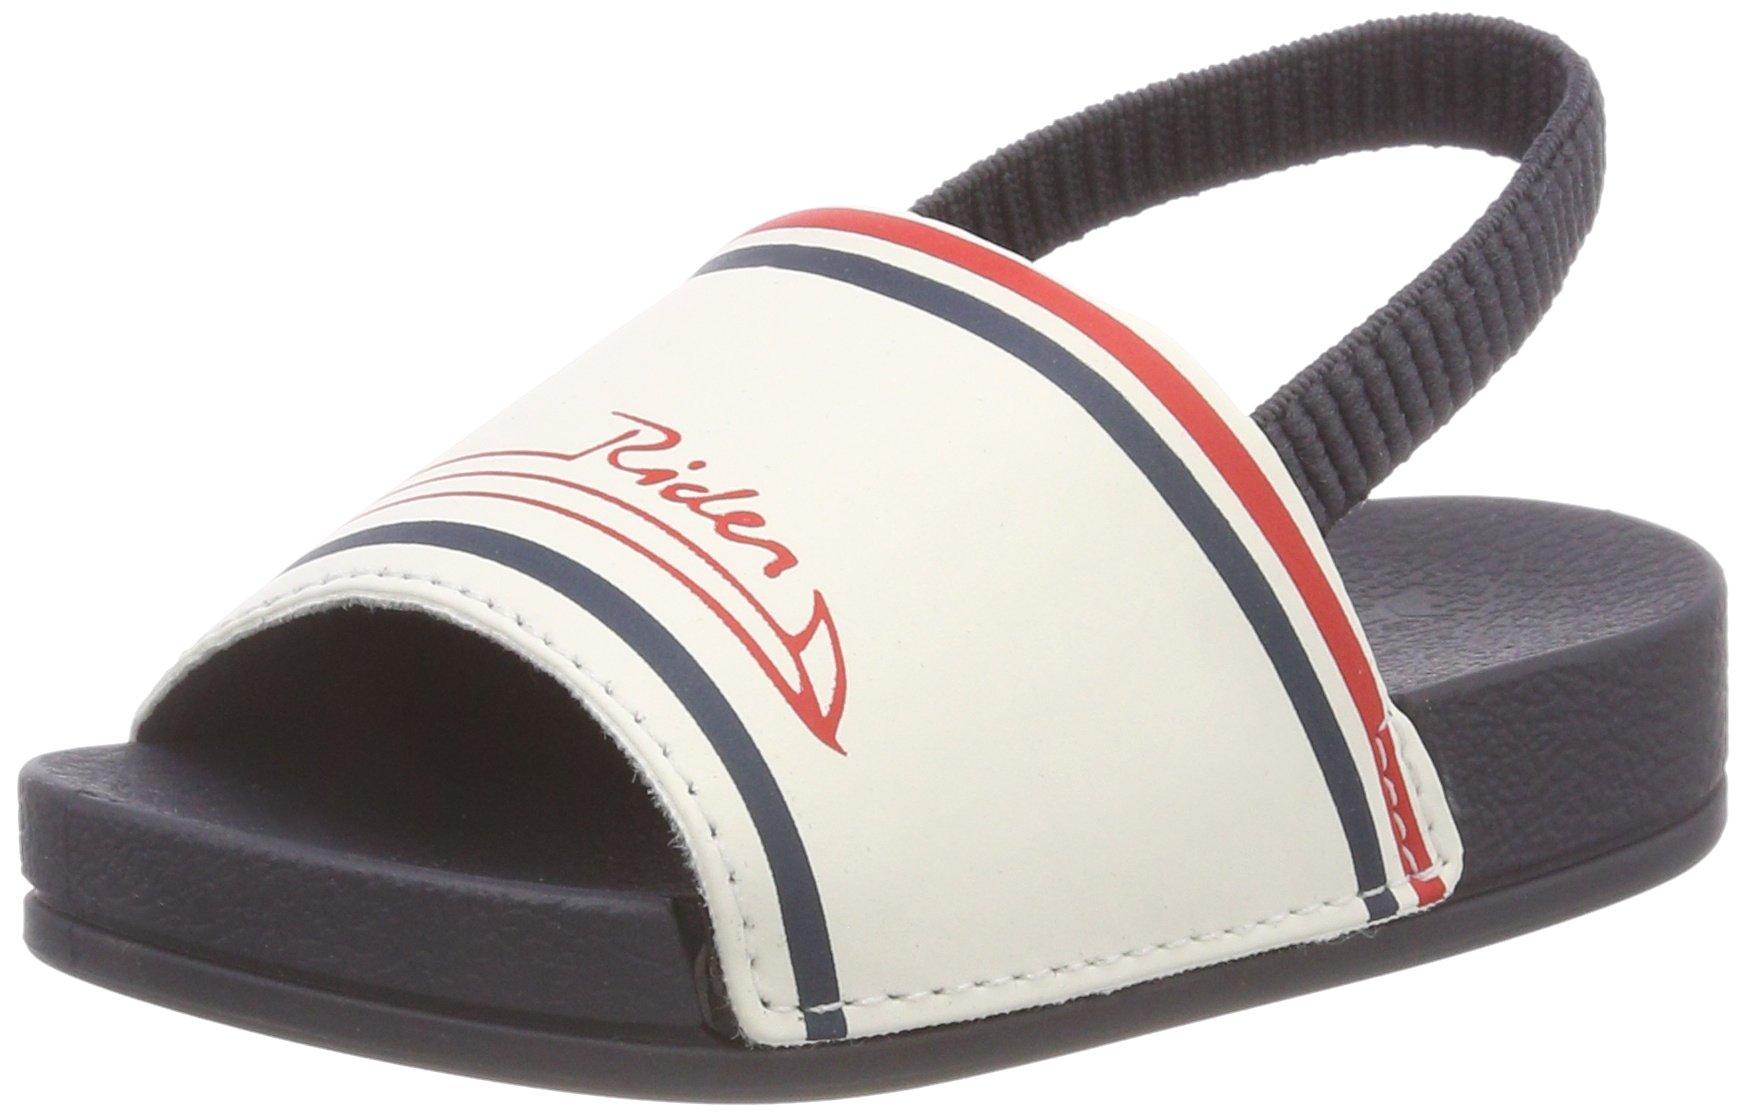 new product aeb2b b2065 Rider R86 Slide Baby, Sandali Unisex – Bimbi 0-24 - Face Shop